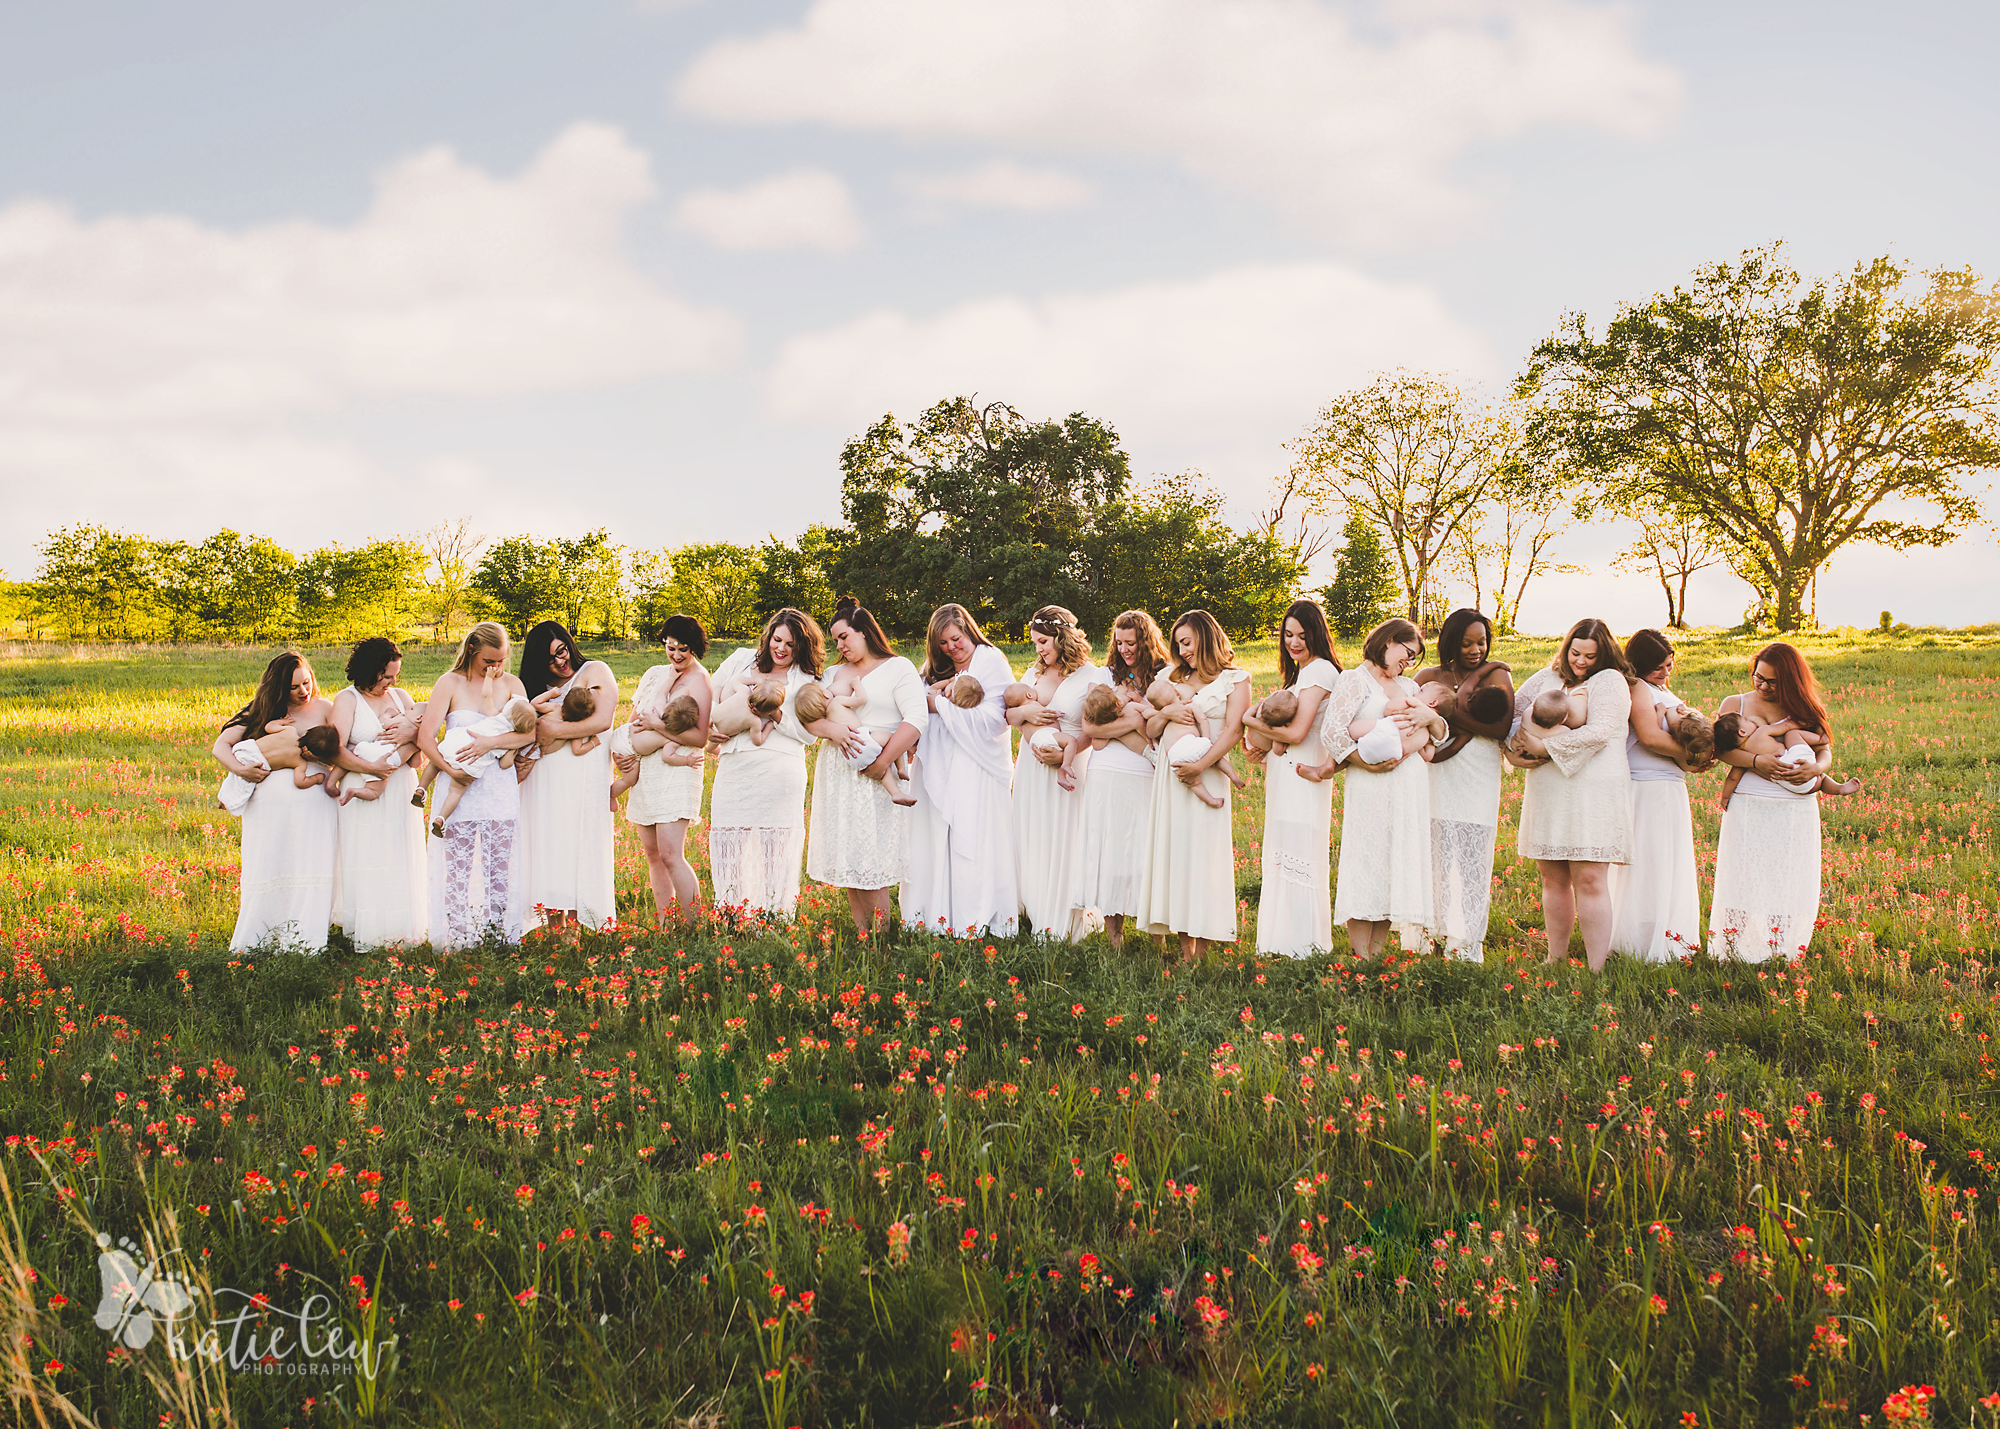 spring breastfeeding group photoshoot